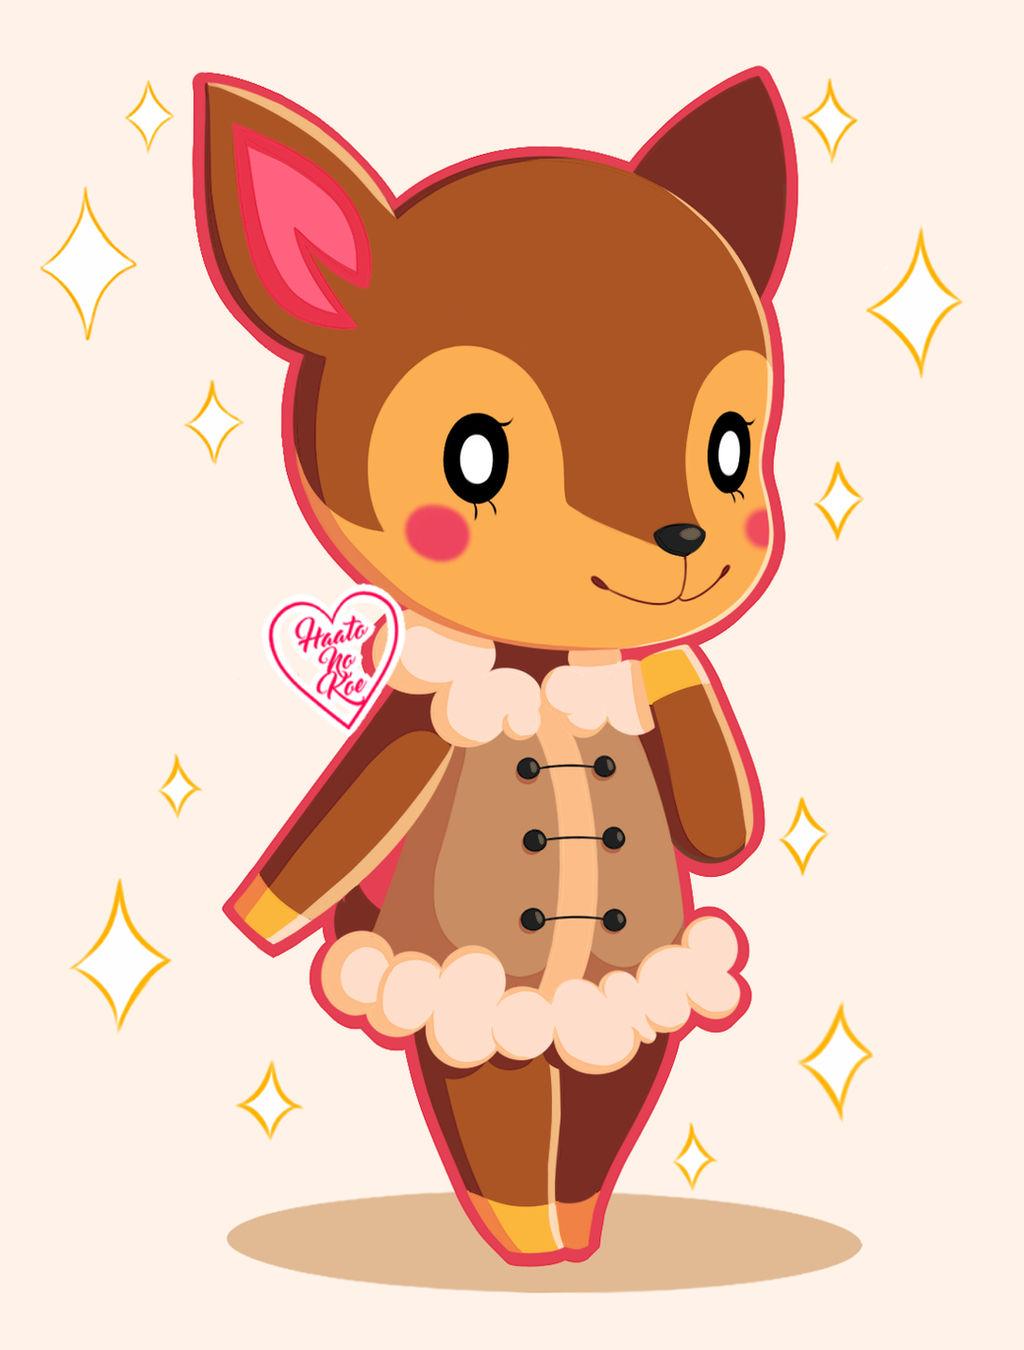 Animal Crossing New Leaf Fauna By Haato No Koe On Deviantart